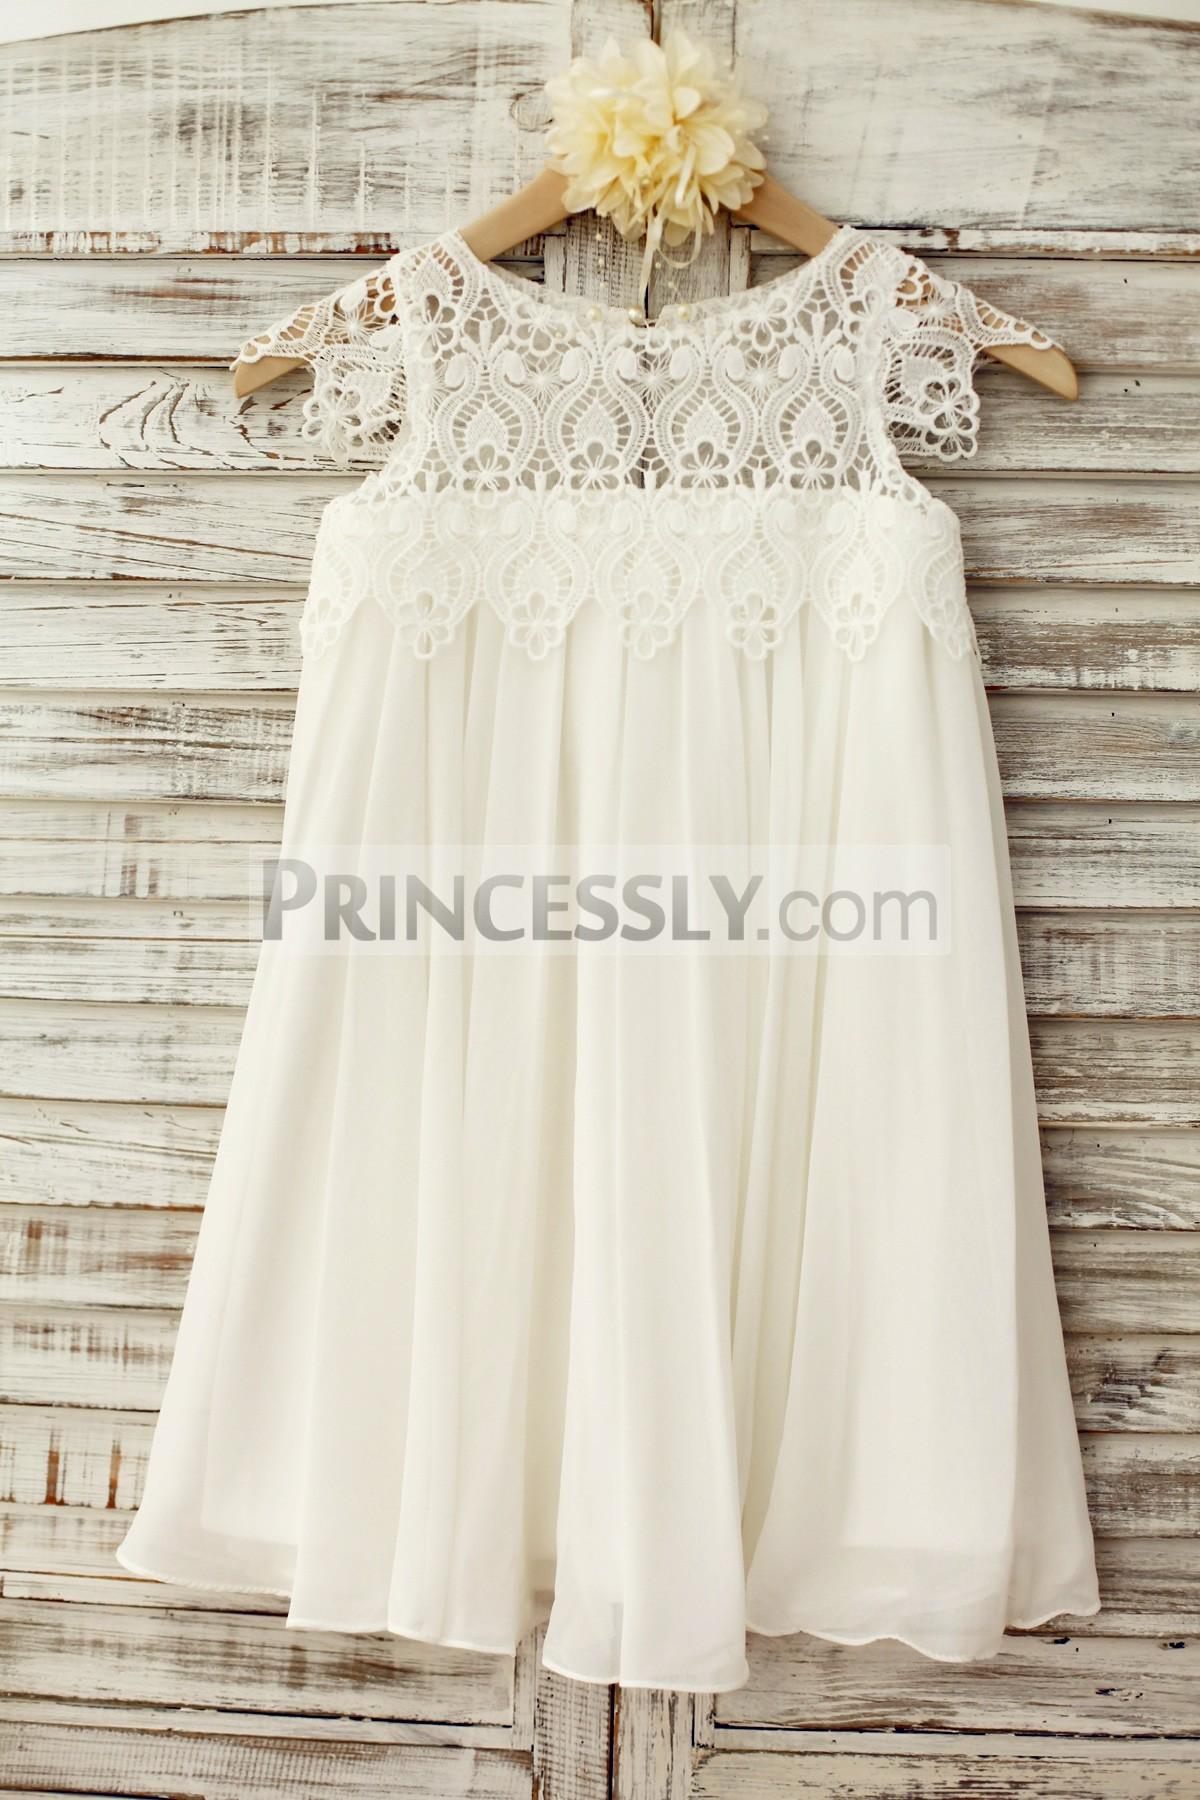 Princessly.com-K1003221-Boho Beach Lace Cap Sleeves Ivory Chiffon Flower Girl Dress-31